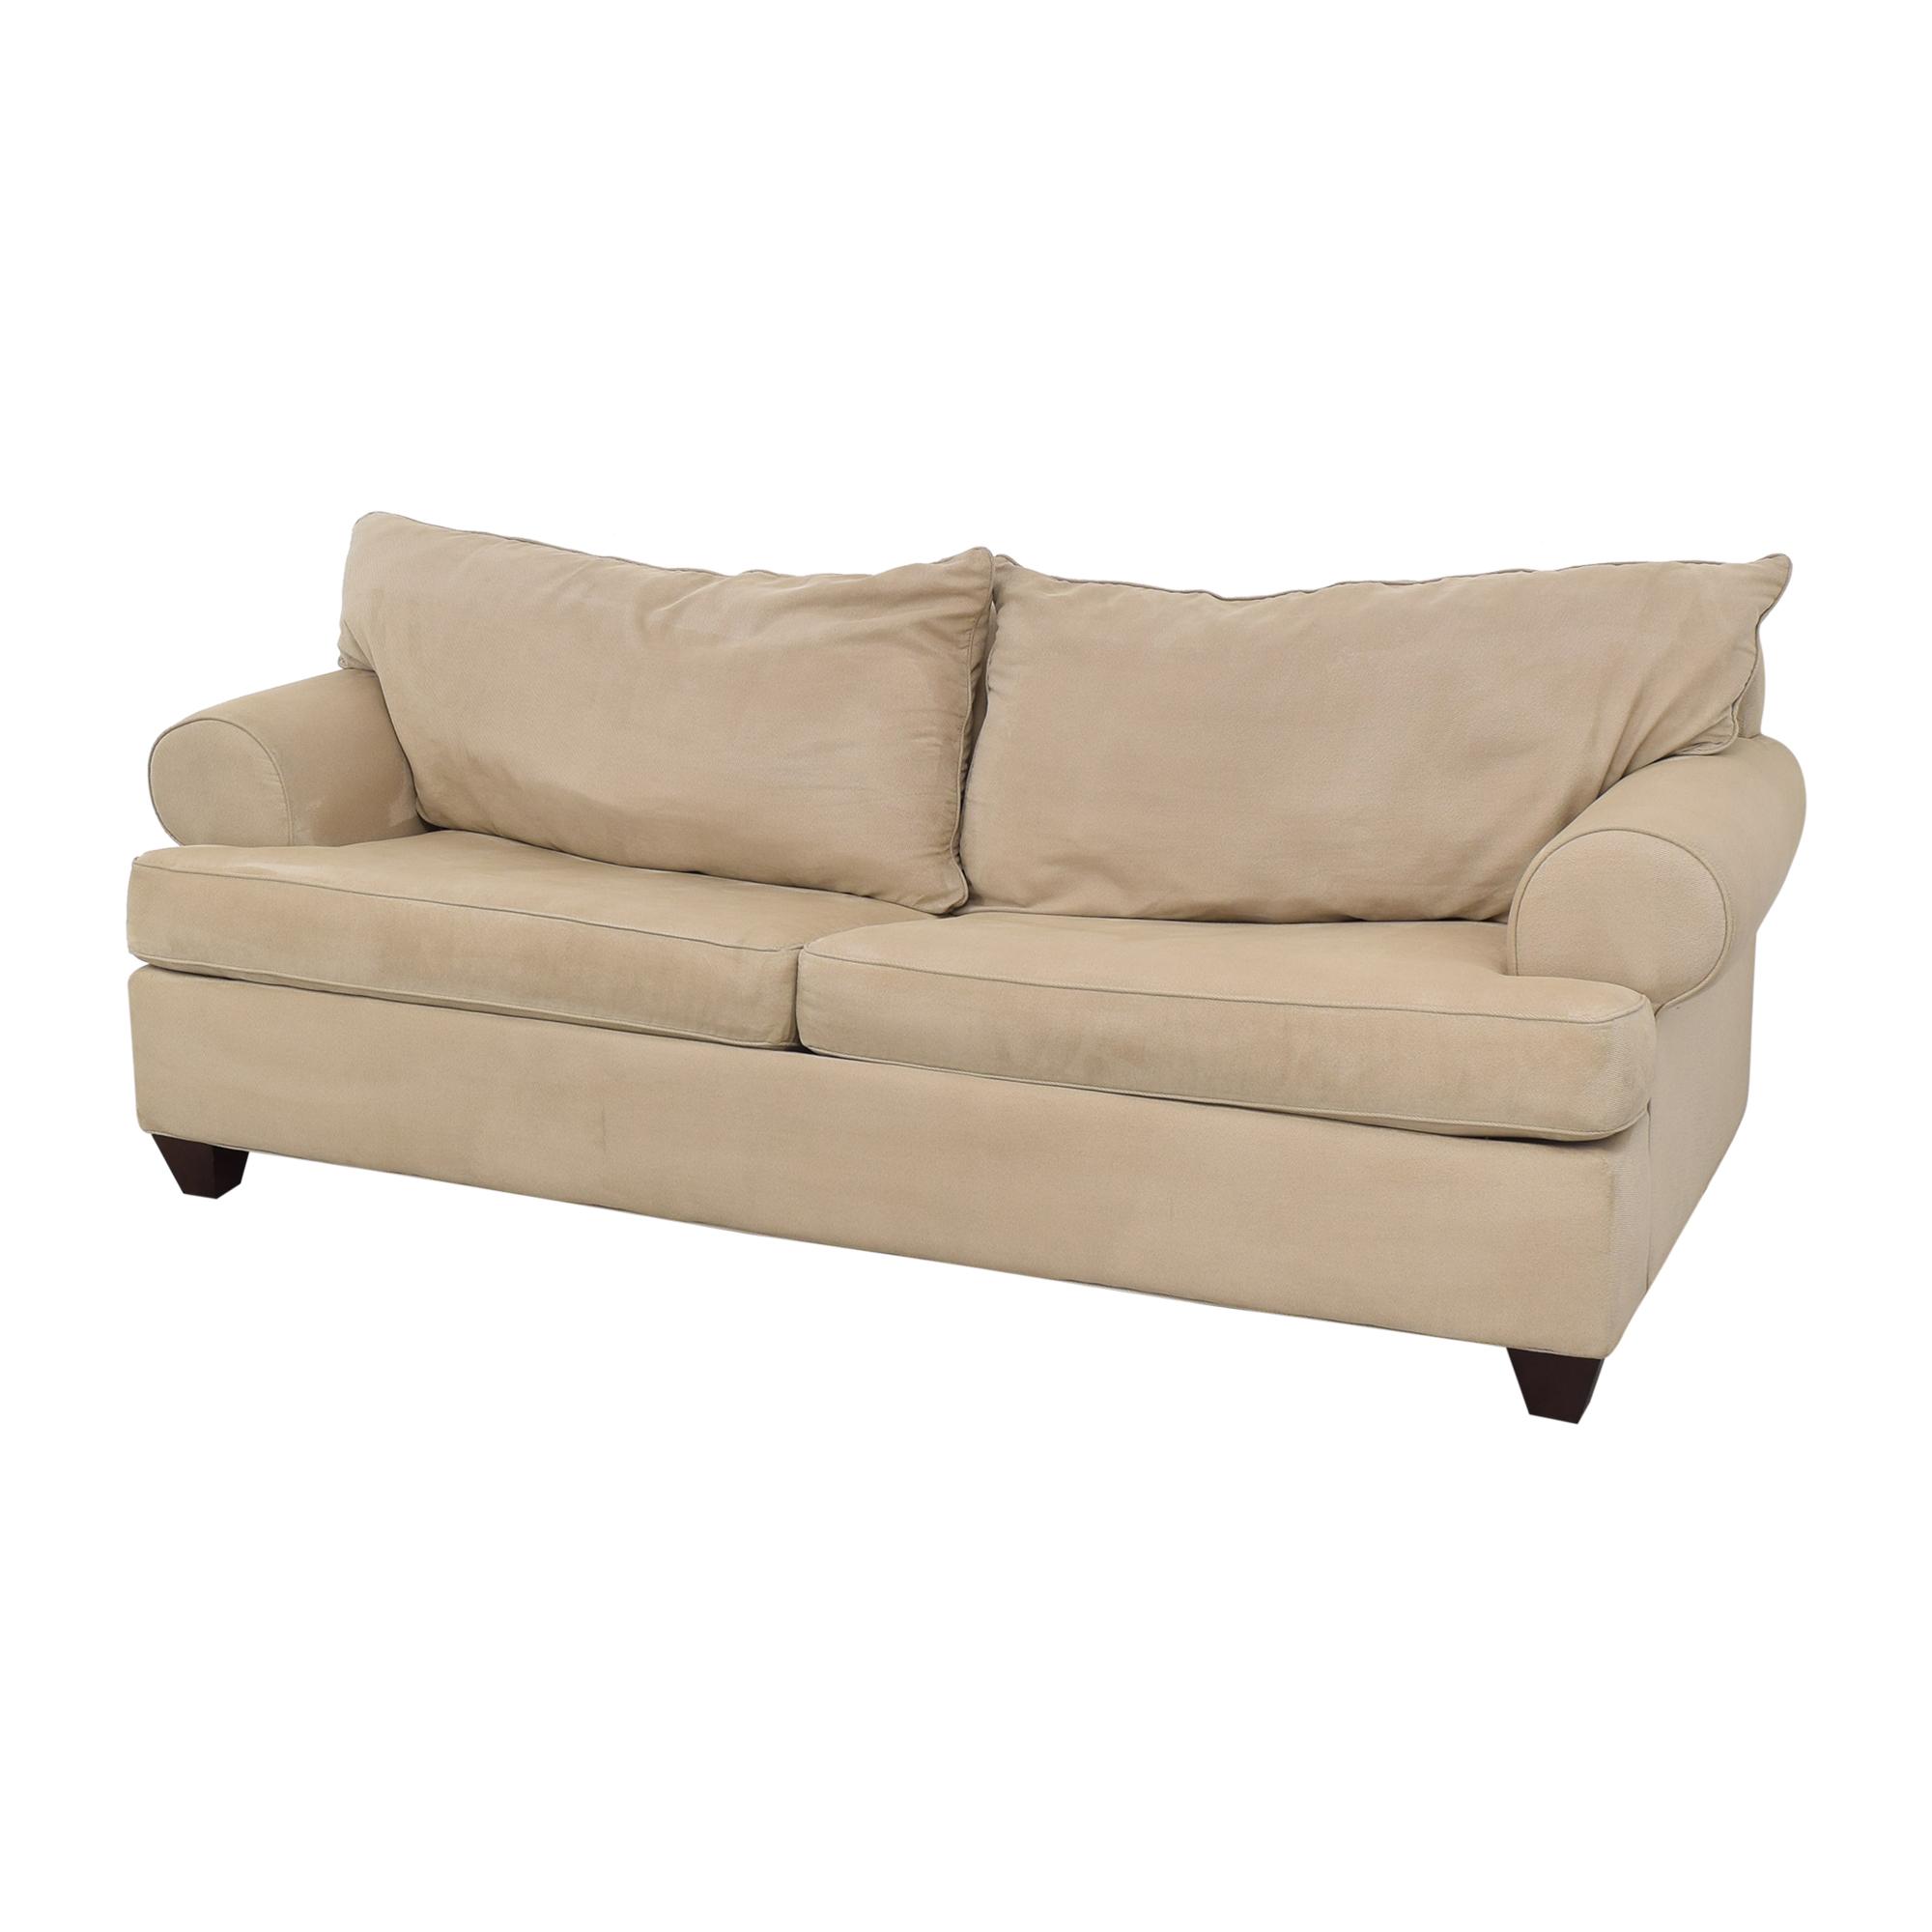 shop Raymour & Flanigan Raymour & Flanigan Sleeper Sofa online